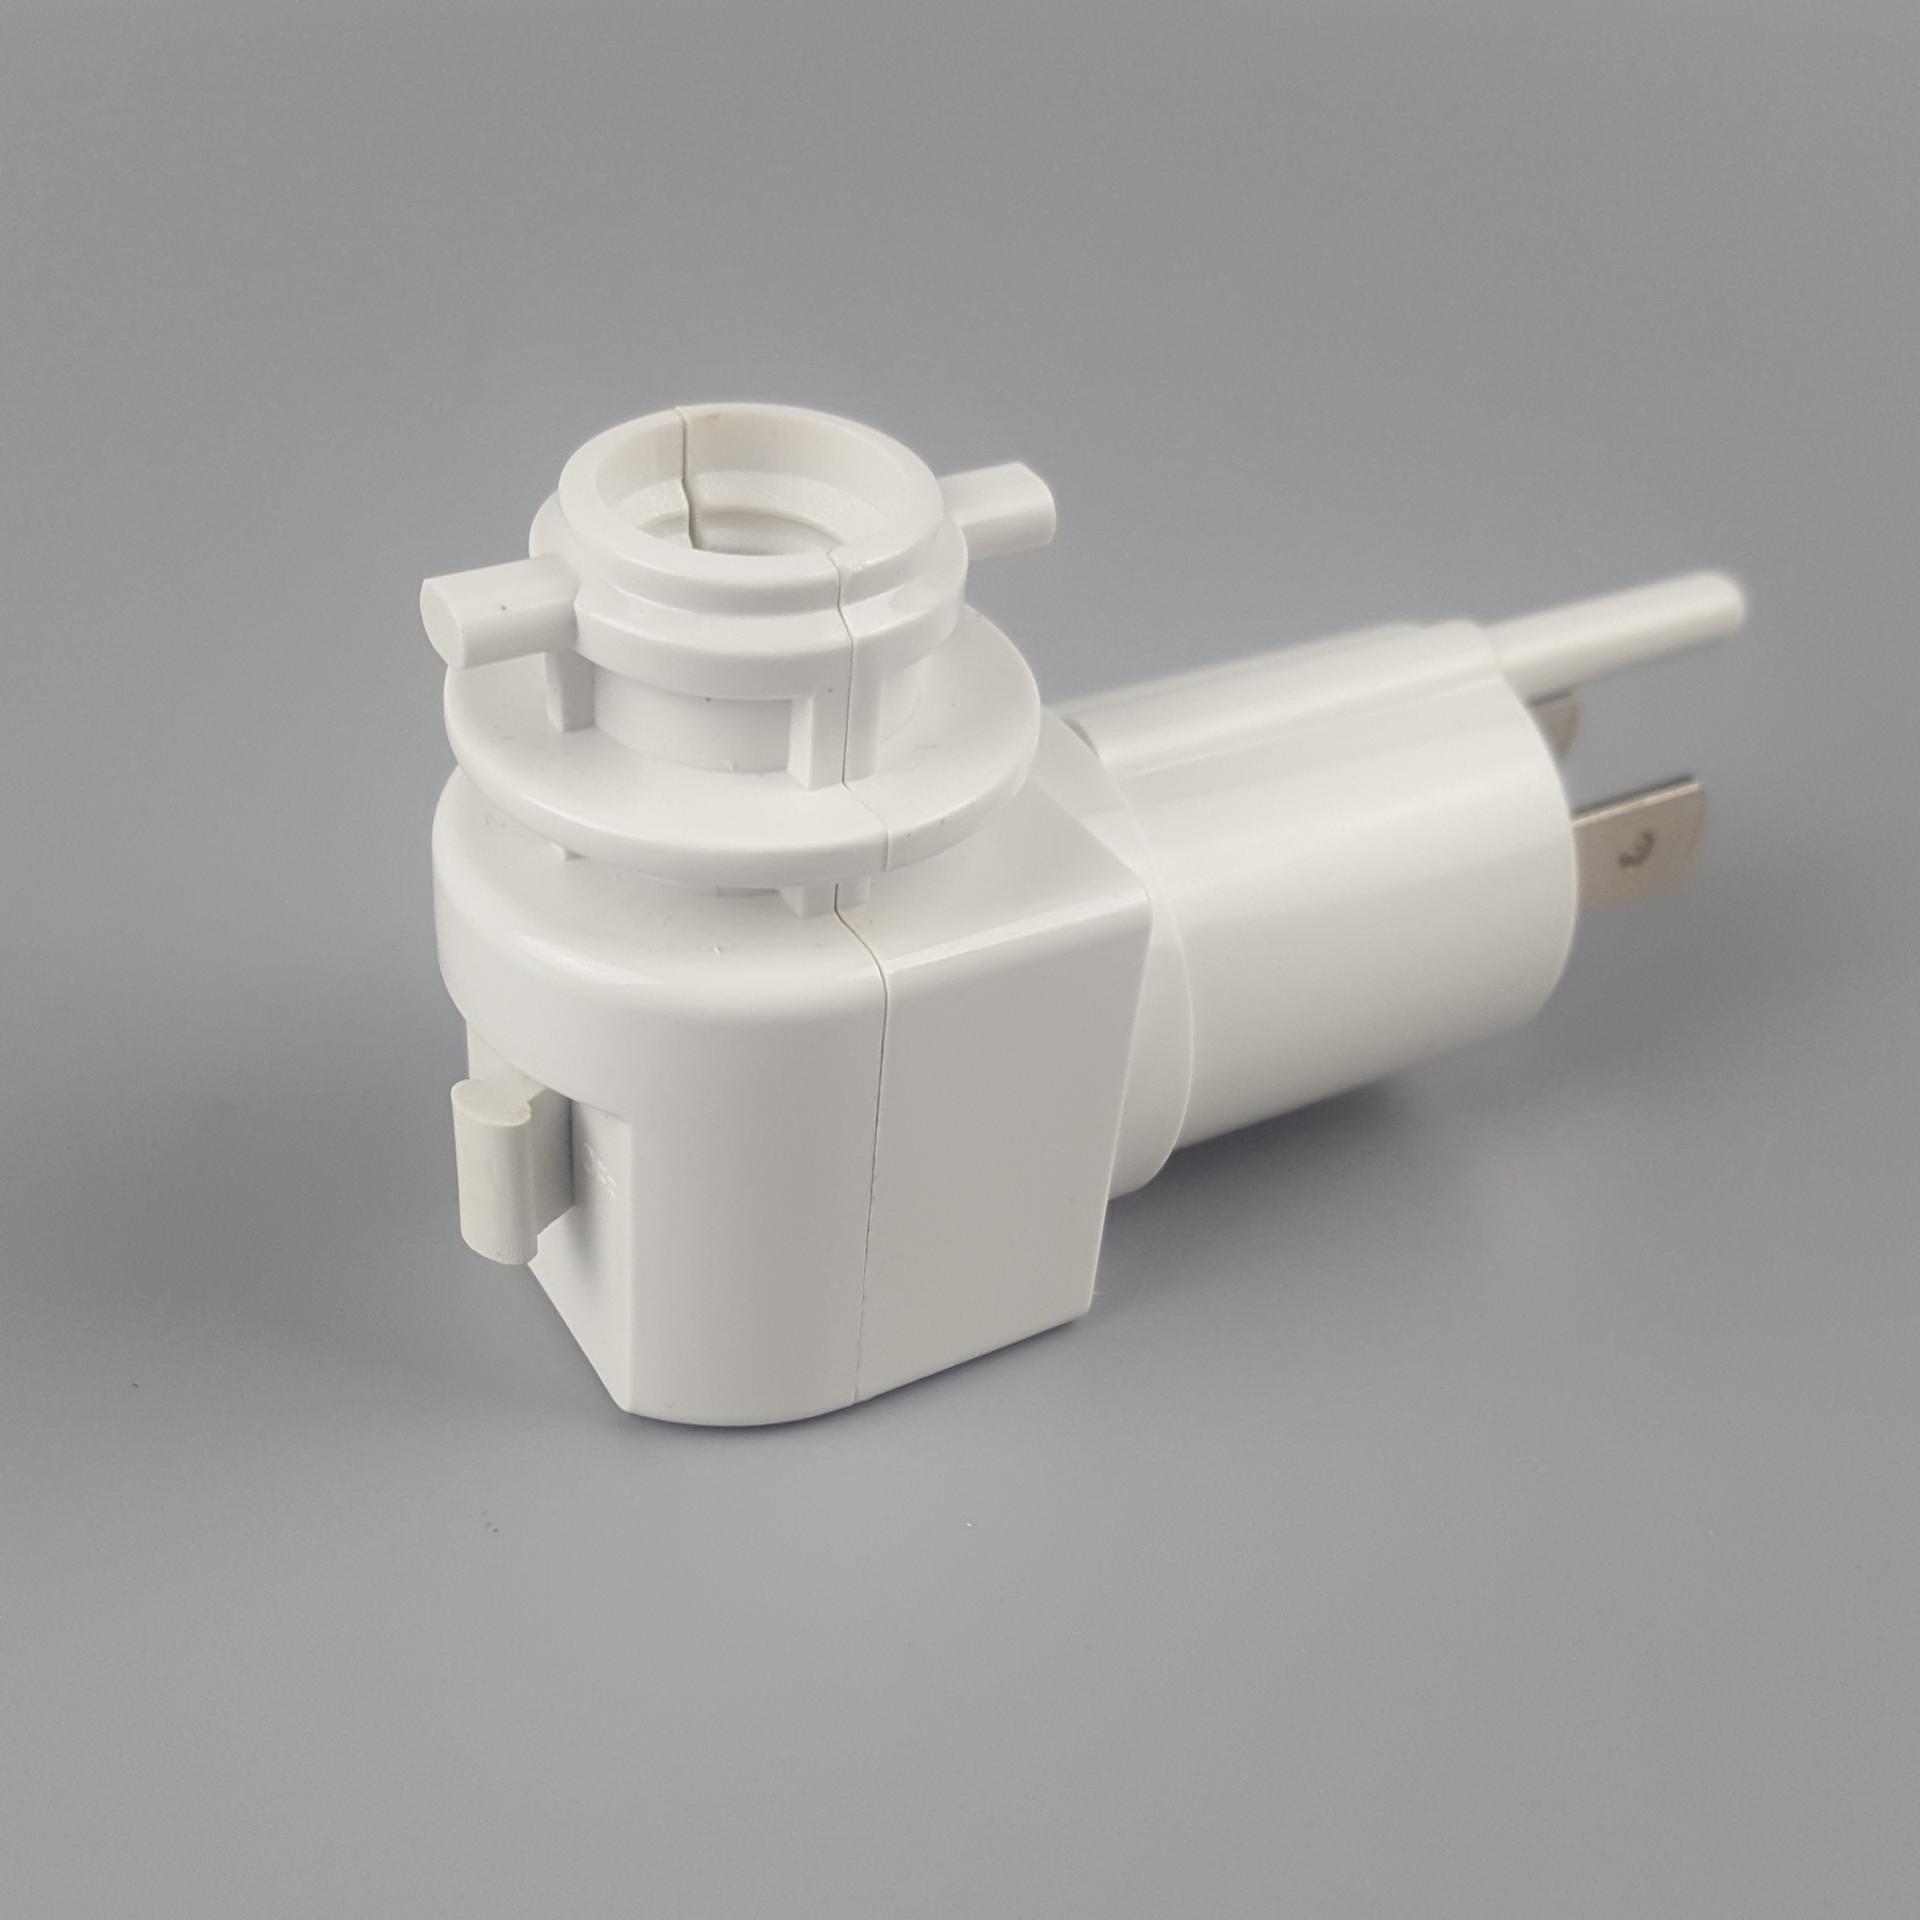 E12 lamp socket holder ETL USA canada Switch salt night light electrical plug 360 rotating and plug in for salt lamp